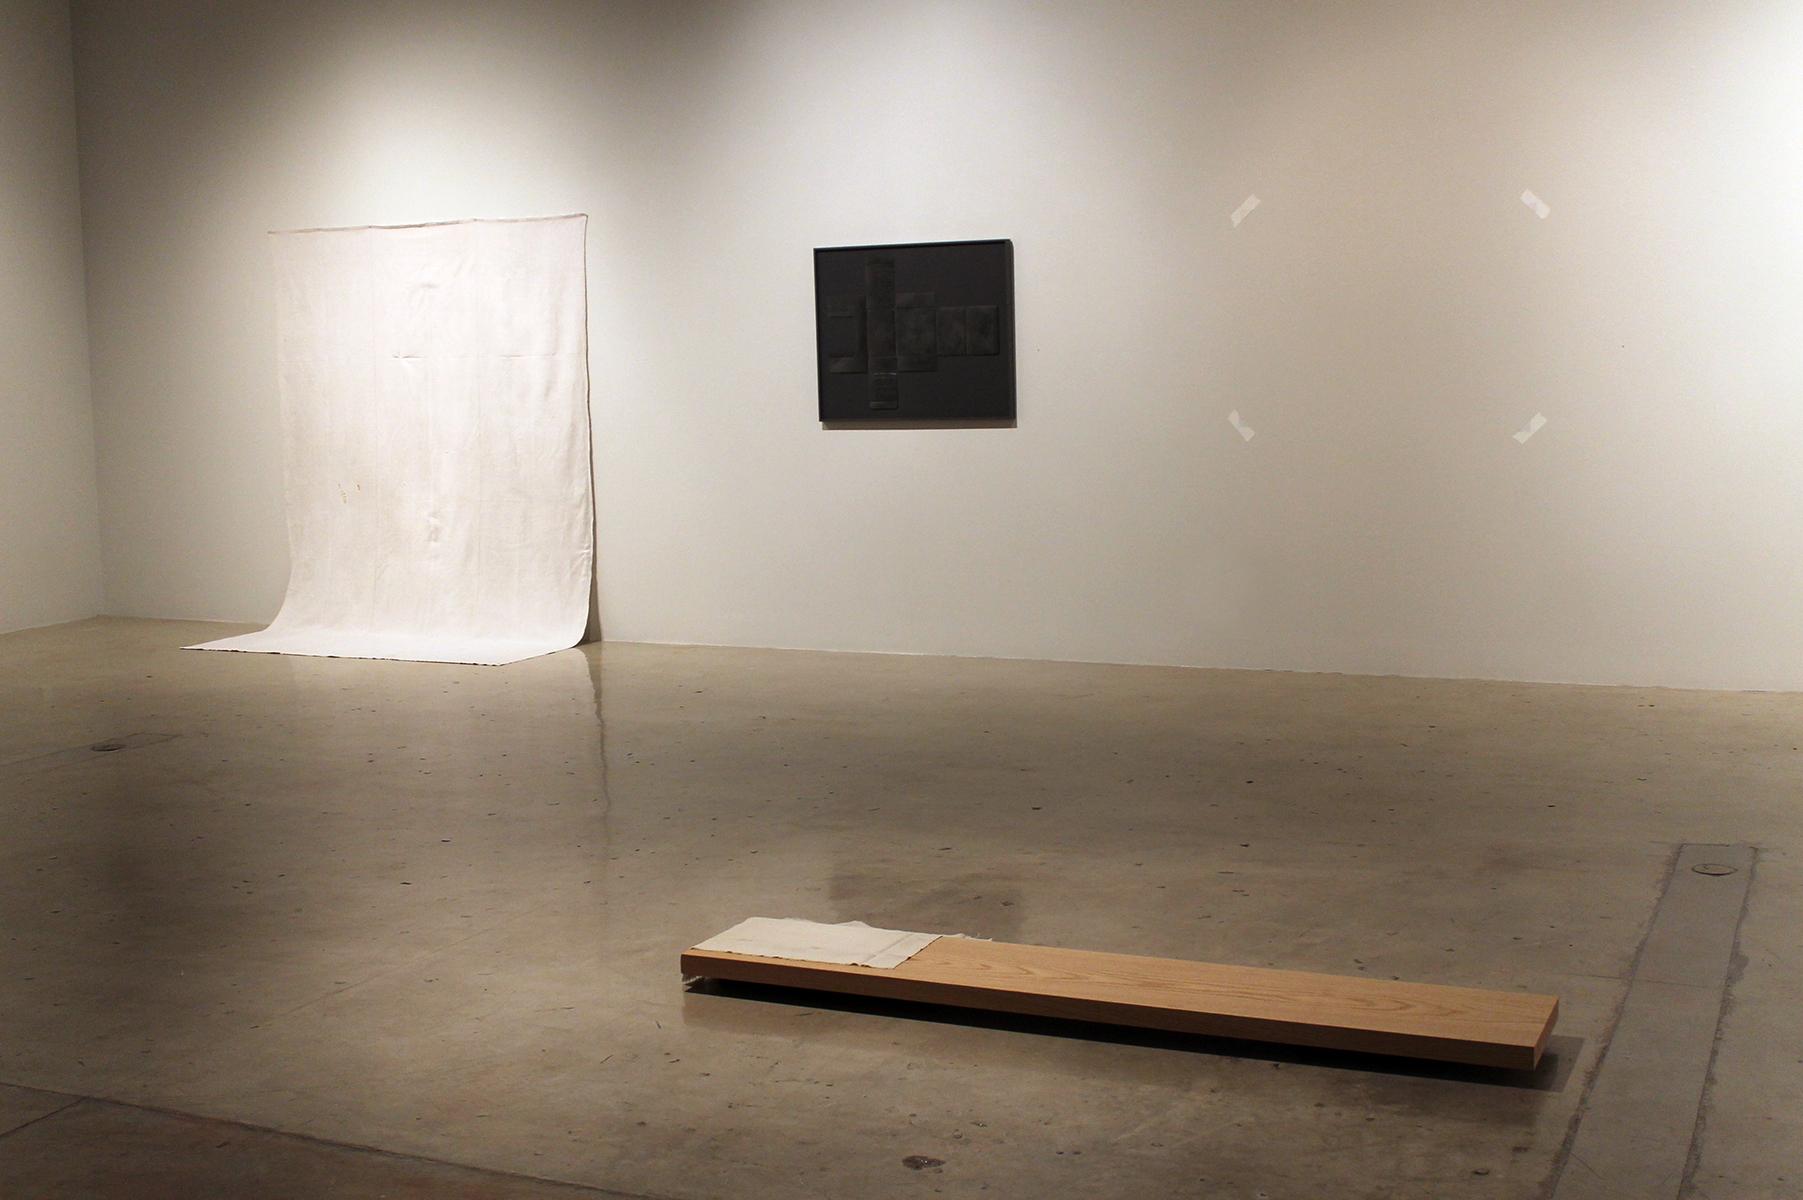 Volume I installation view at Joseph Gross Gallery, Tucson, AZ, 2015